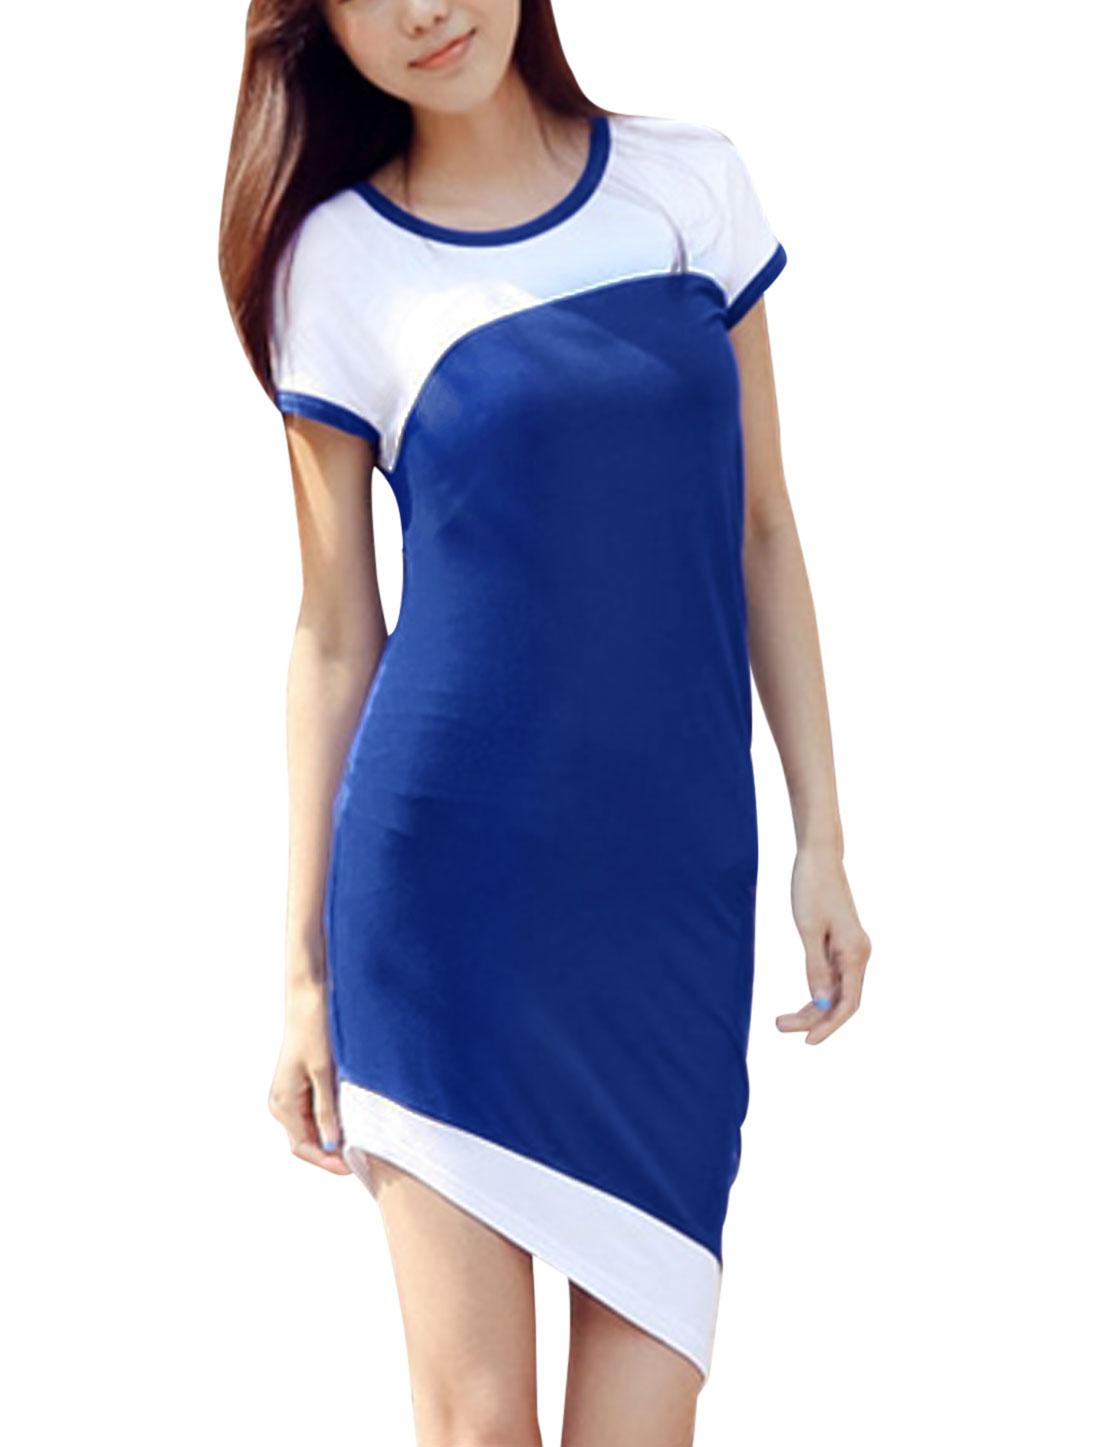 Lady Round Neck Short Sleeve Colorblock High Low Hem Dress Royal Blue S